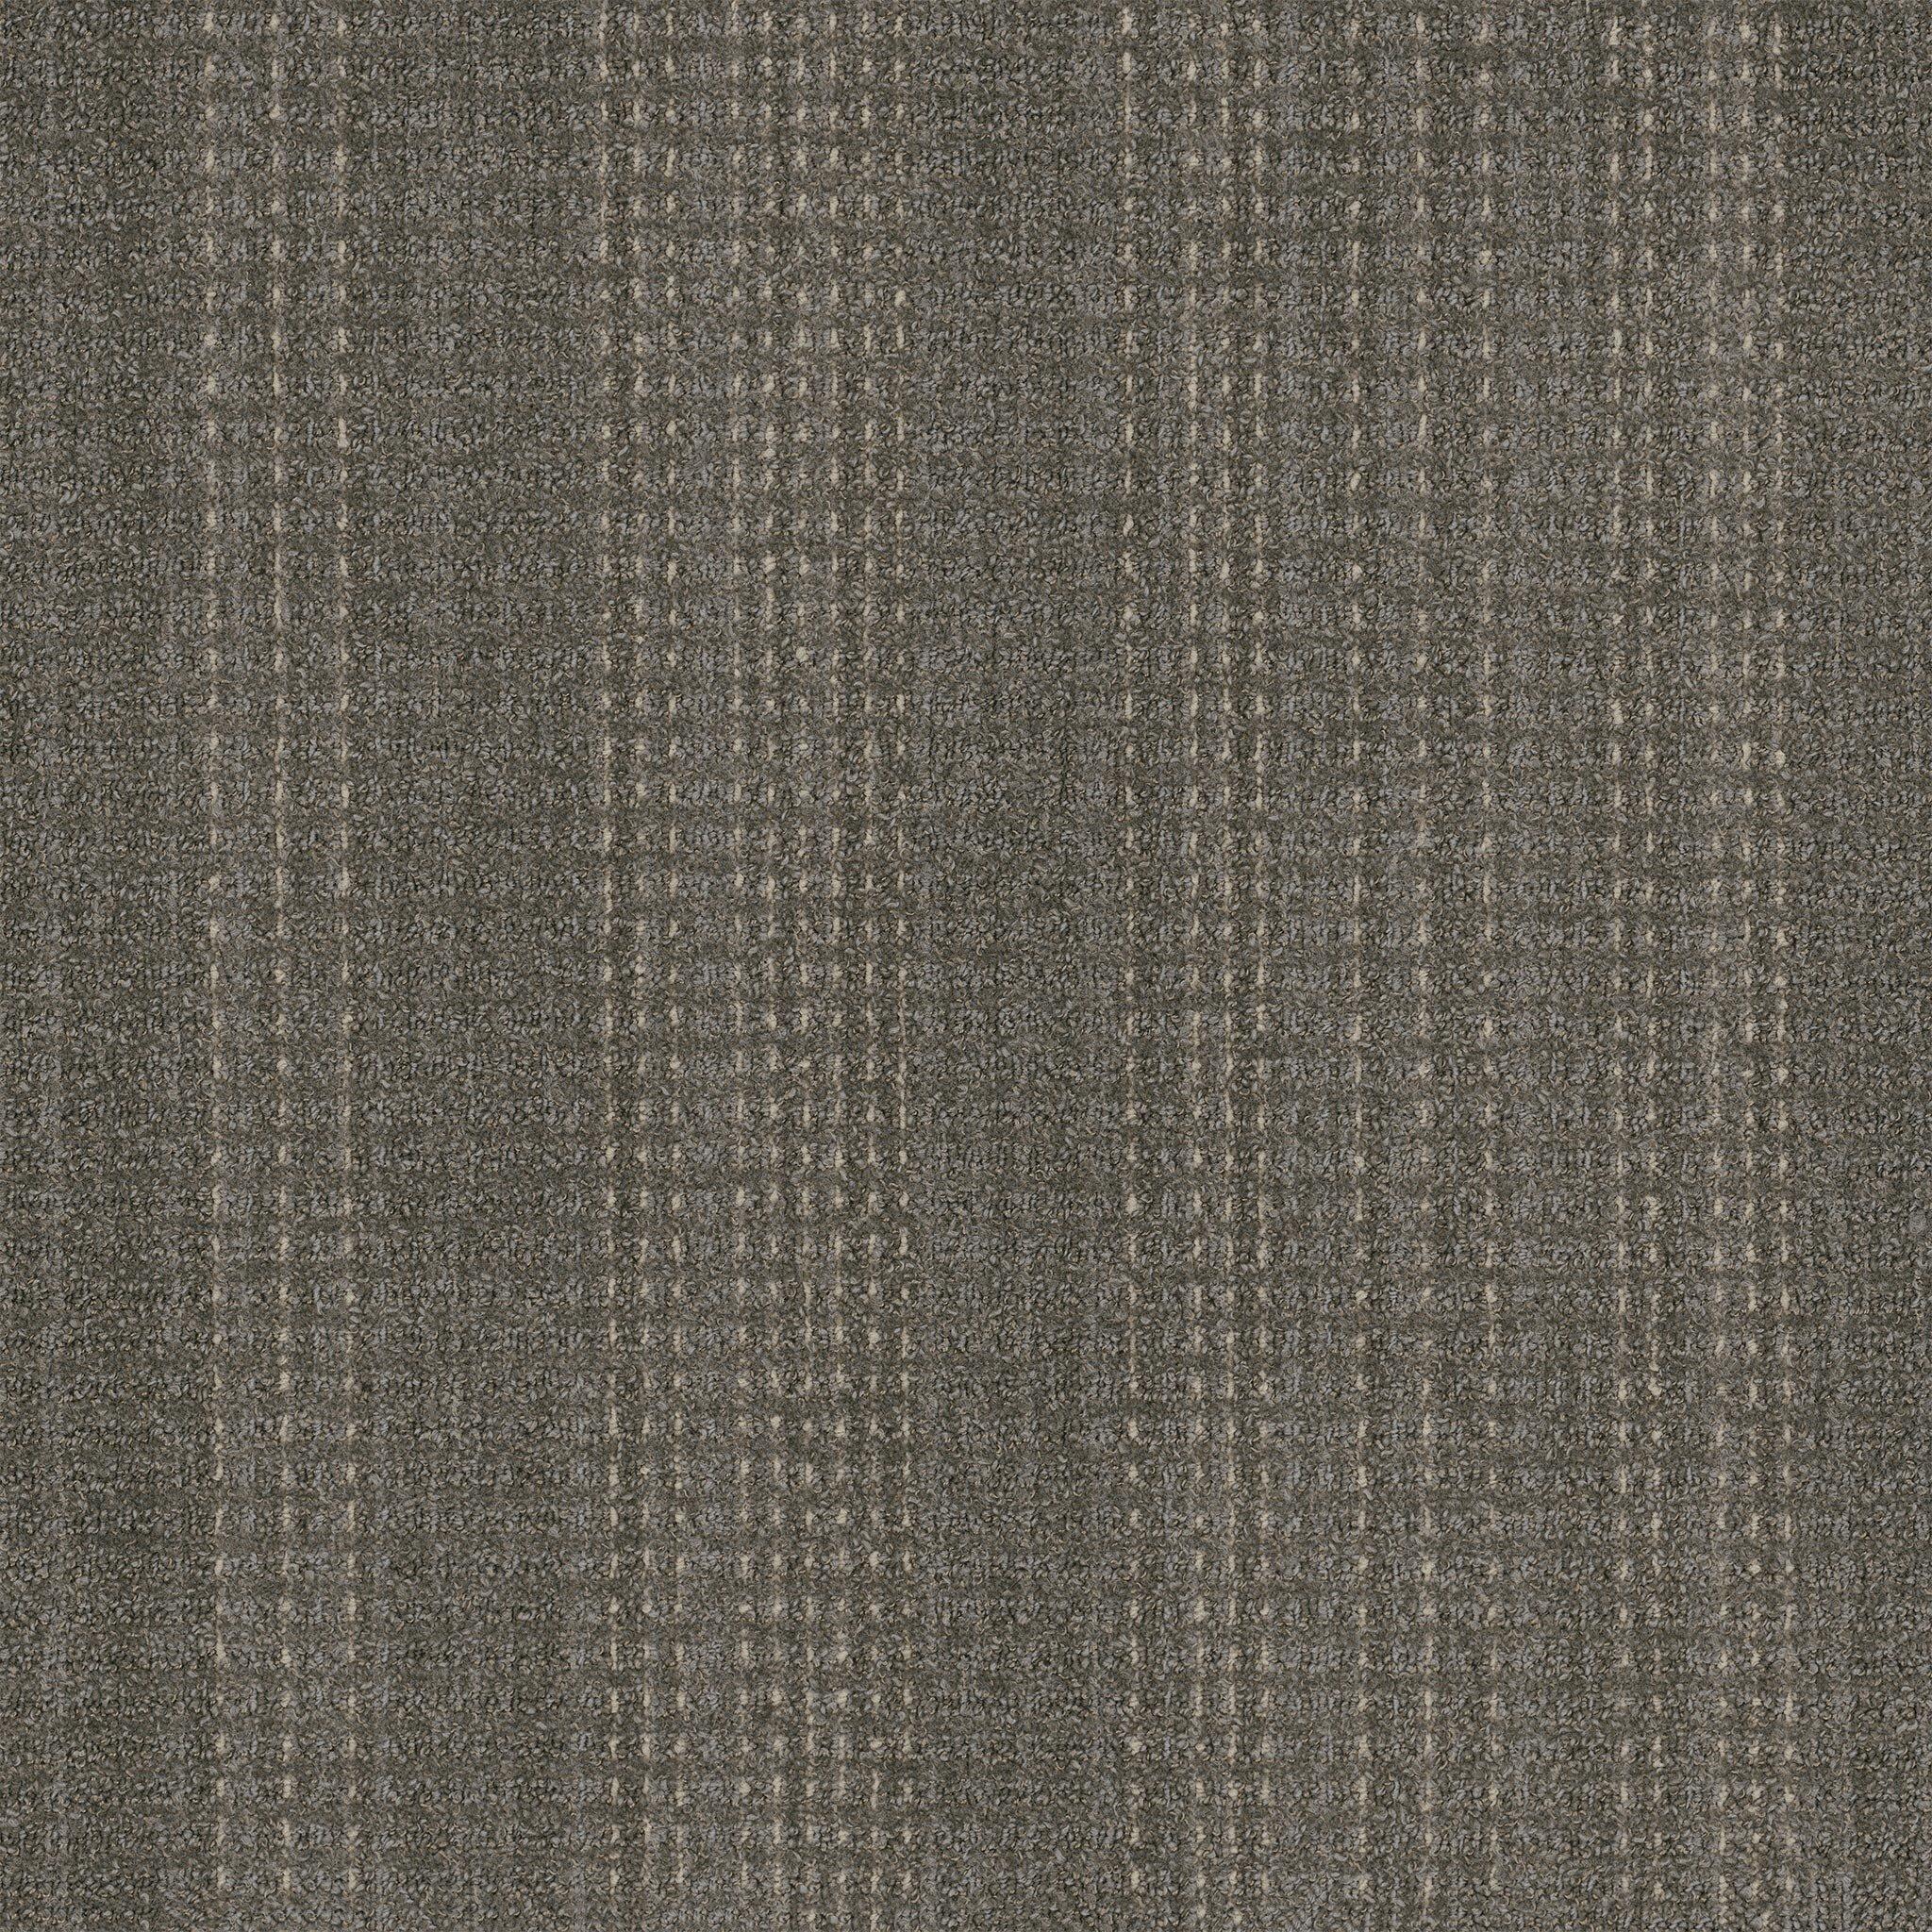 24 X 24 Tile Dimension Thin 25 5 Carpet Tiles You Ll Love In 2021 Wayfair